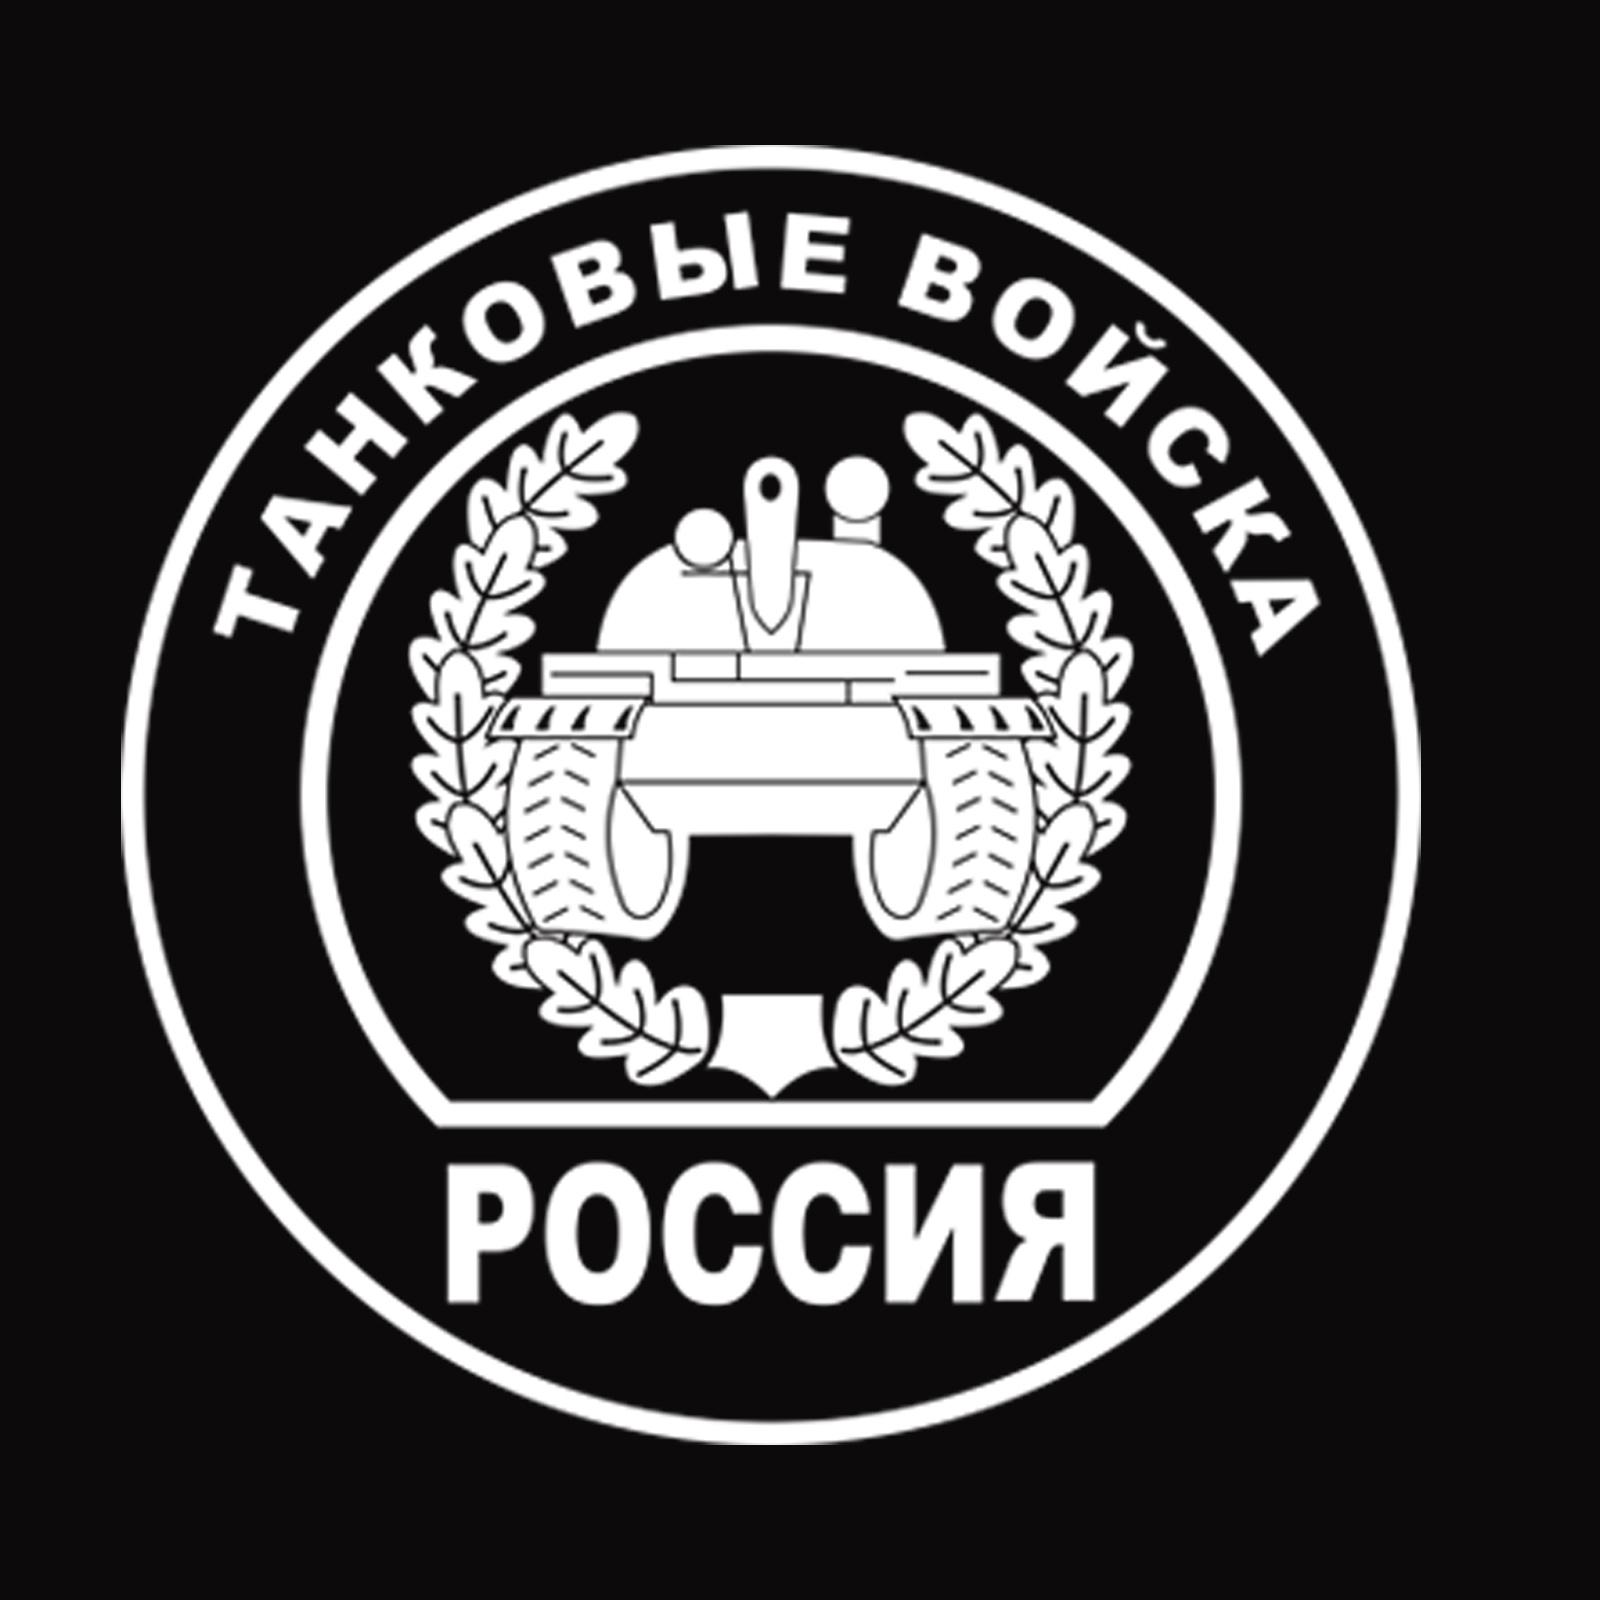 Футболка танкисту